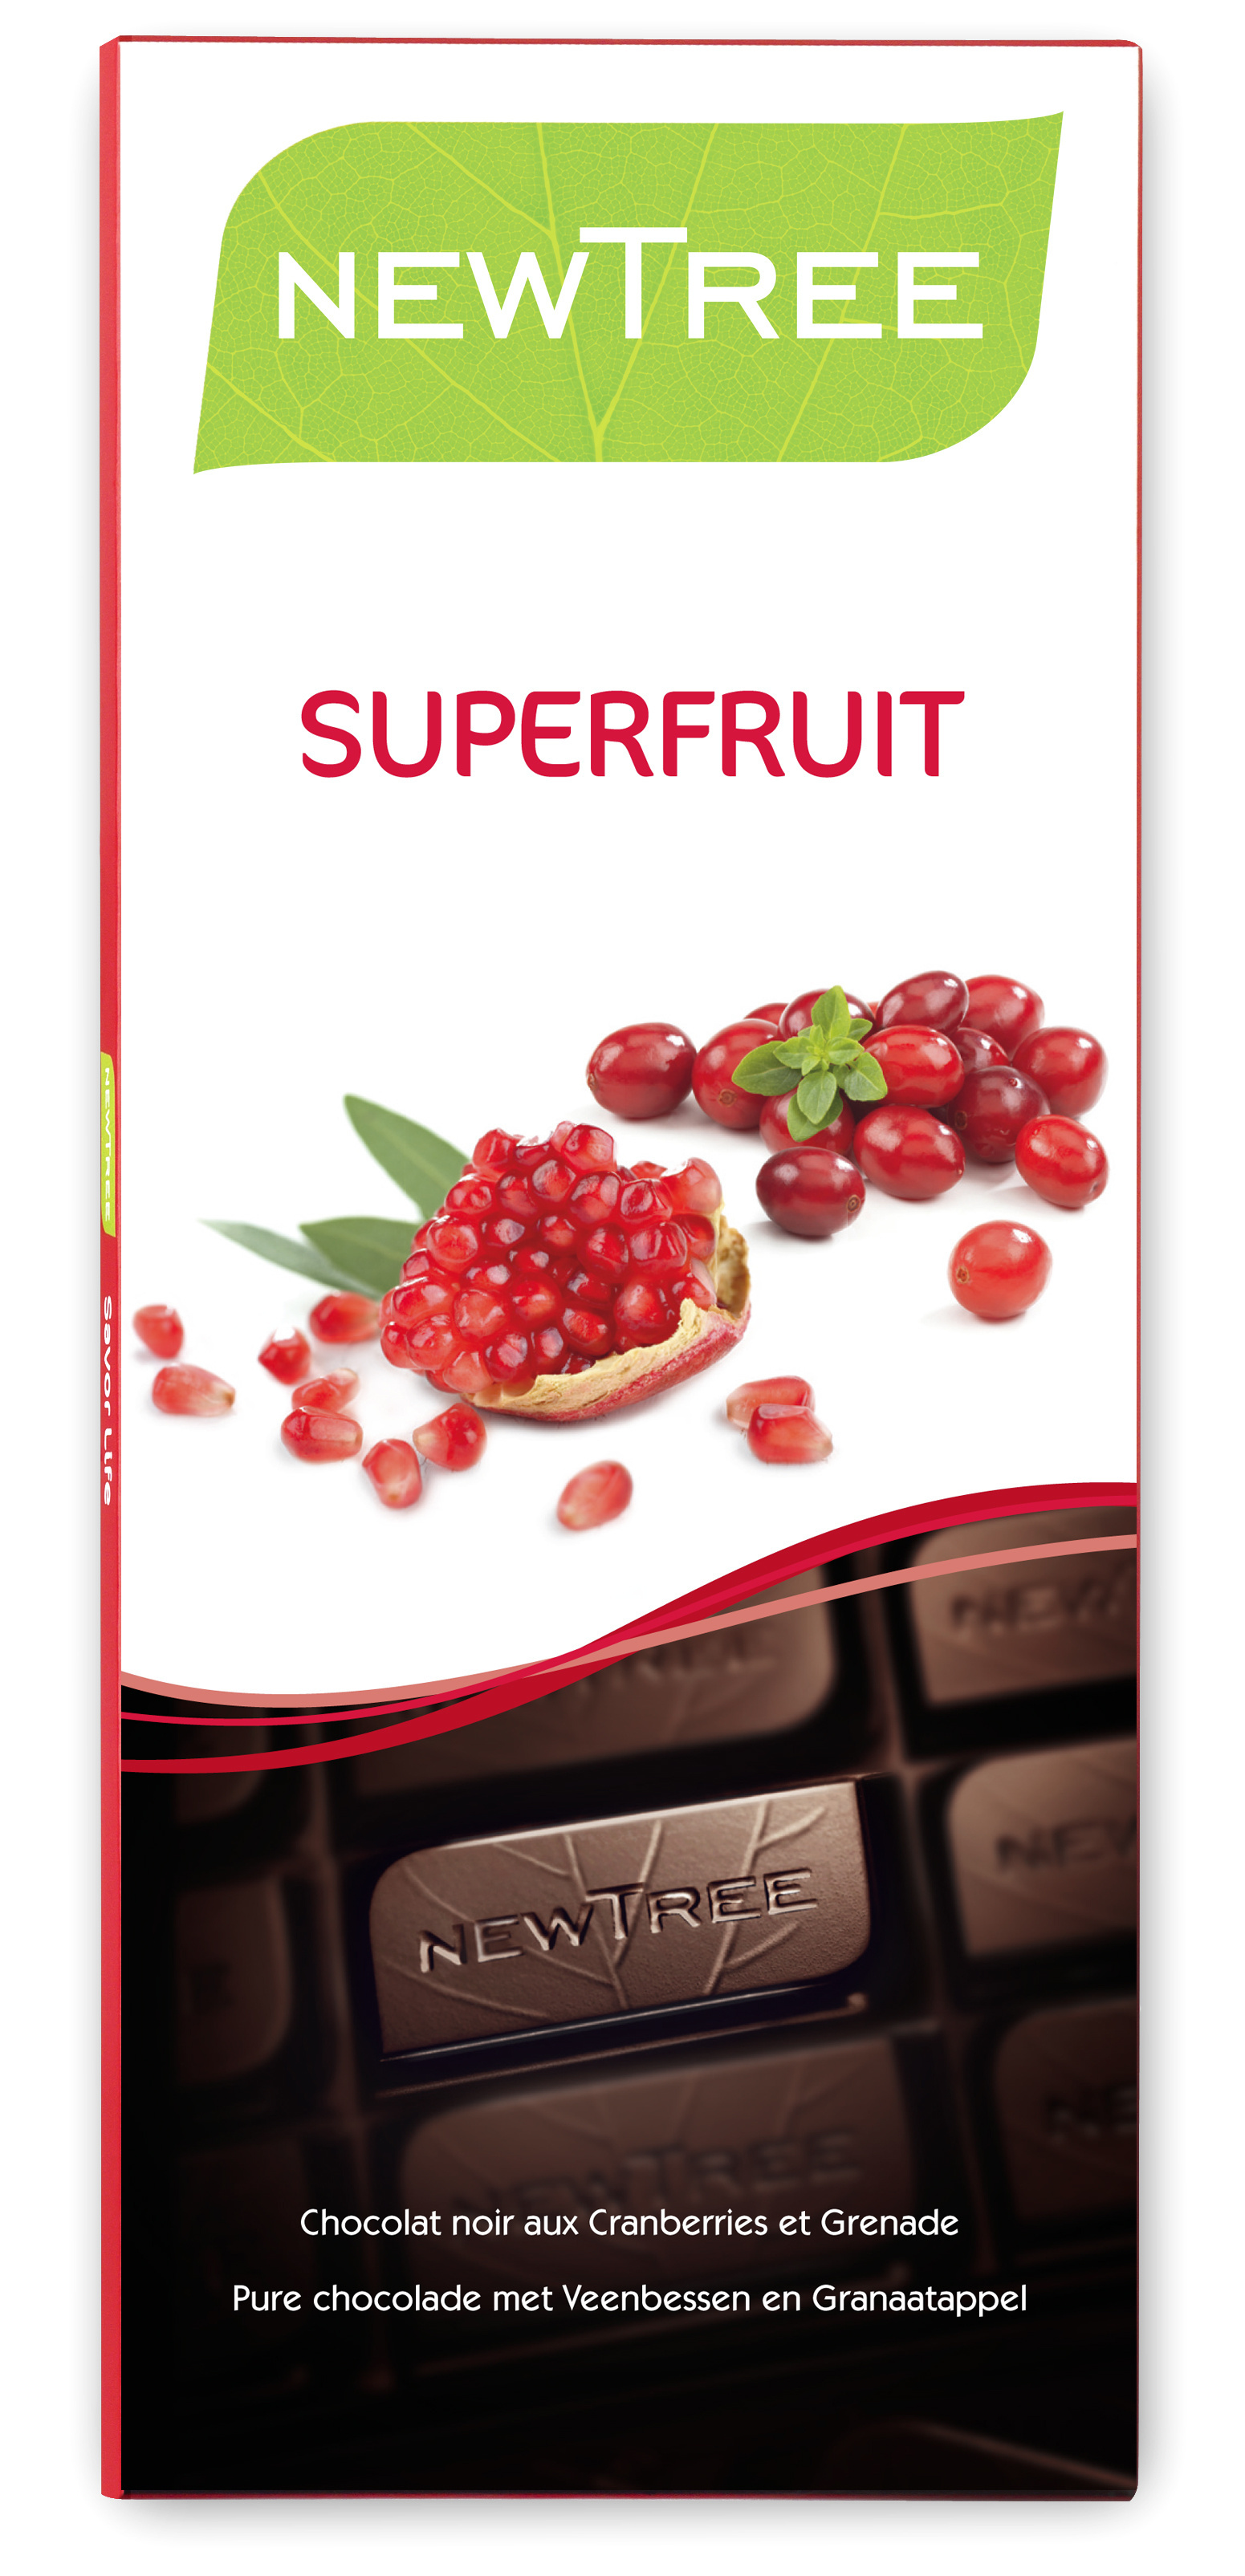 NewTree Superfruit - Product